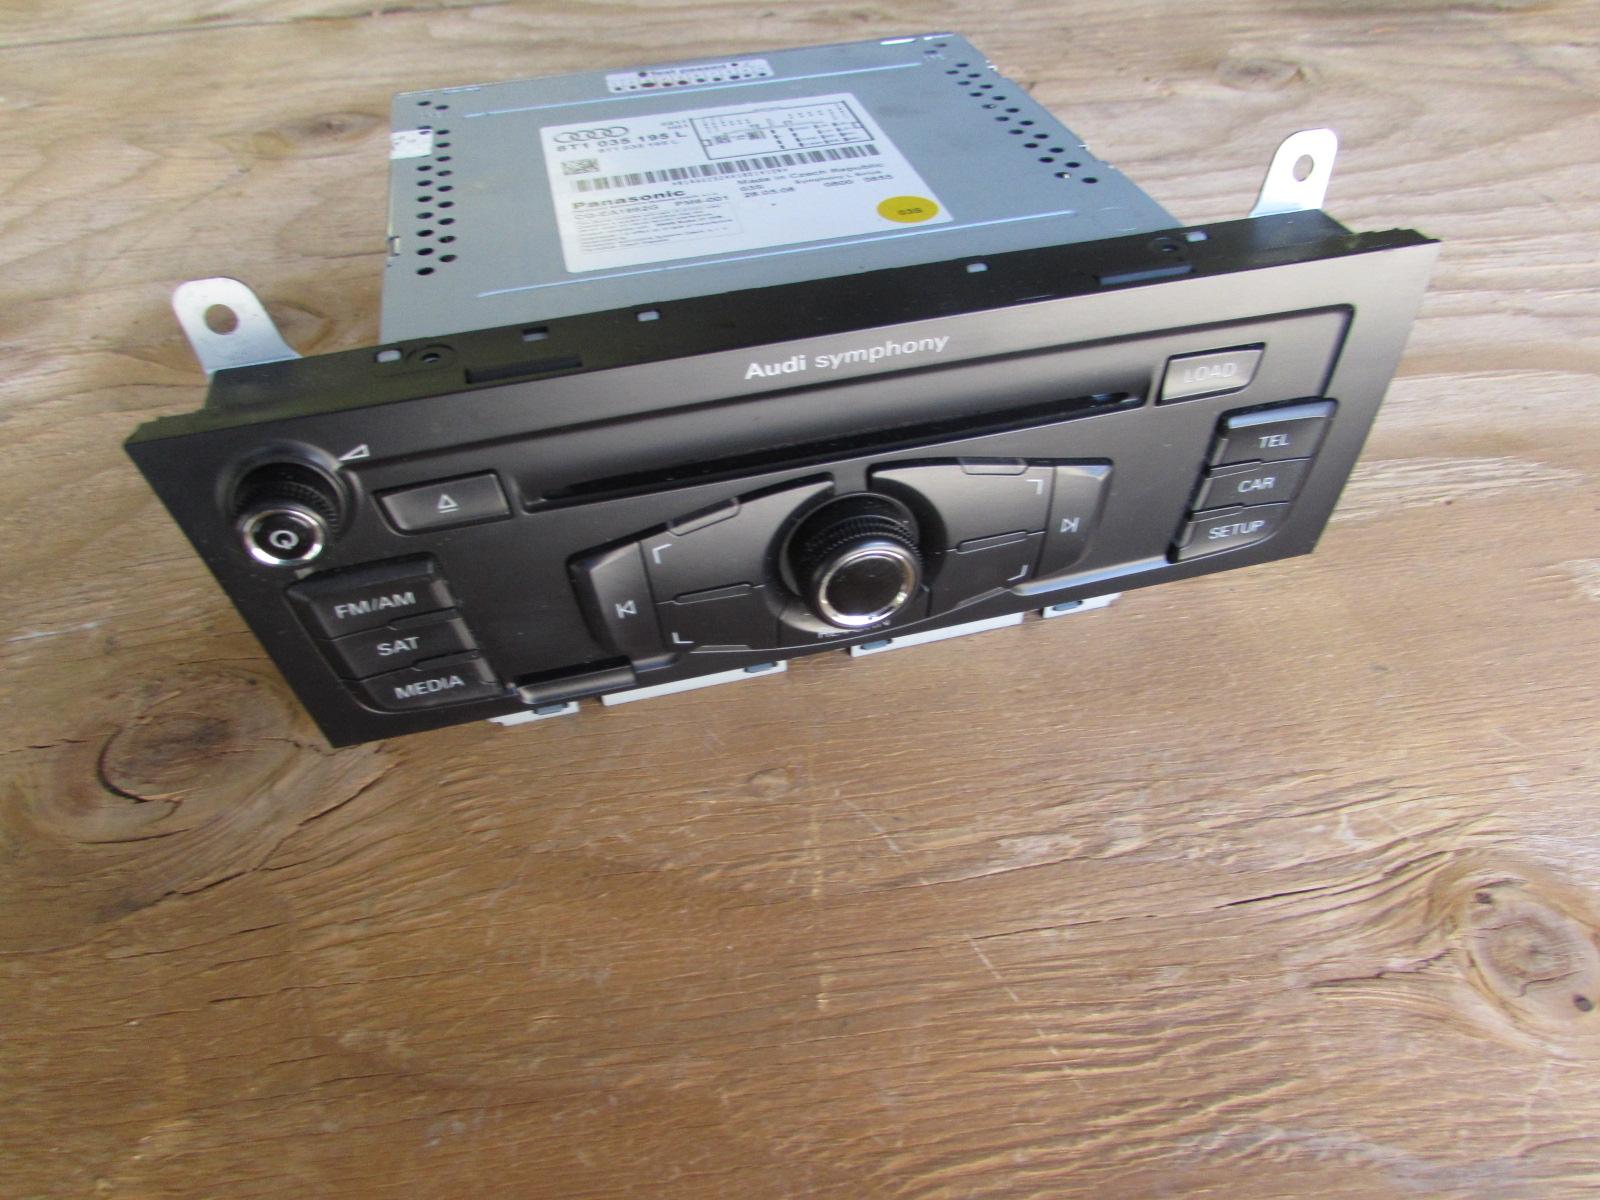 Audi OEM 09 A4 B8 6 Disc CD Player Radio Stereo Head Unit Receiver  Panasonic Symphony 8T1035195L